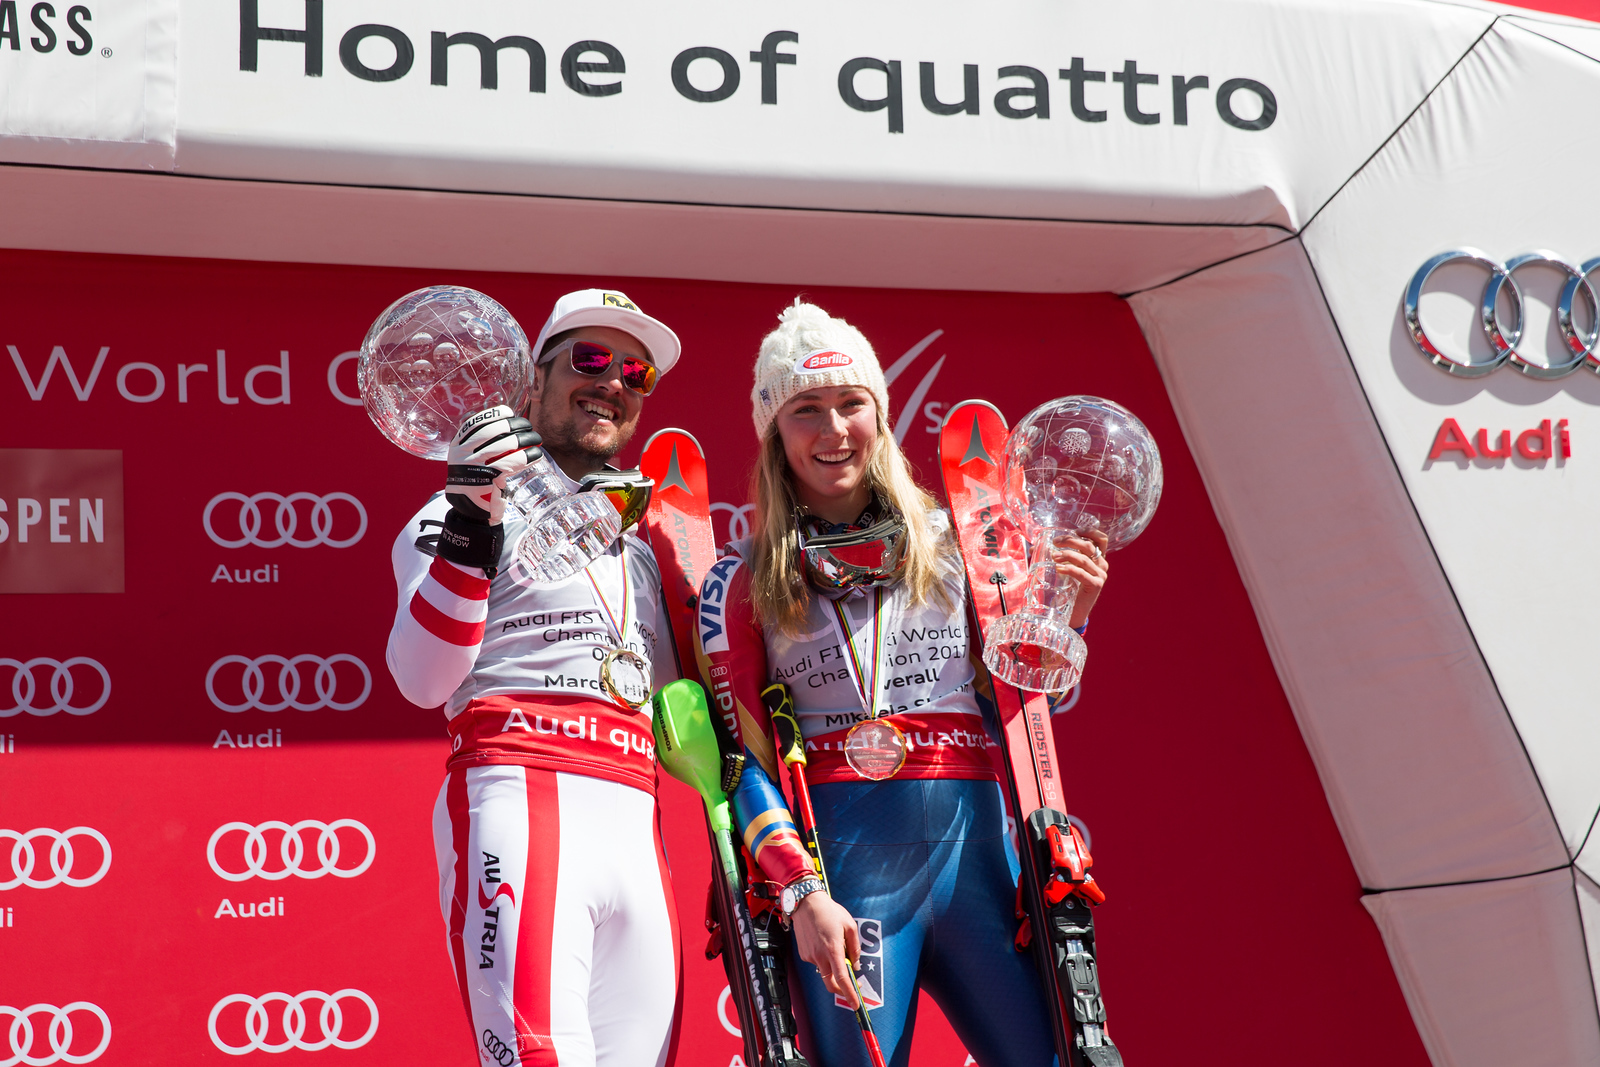 Marcel Hirscher and Mikaela Shiffrin 2016-17 Alpine Overall World Cup Champion Crystal Globe 2017 Audi FIS Ski World Cup finals in Aspen, CO. Photo: U.S. Ski Team